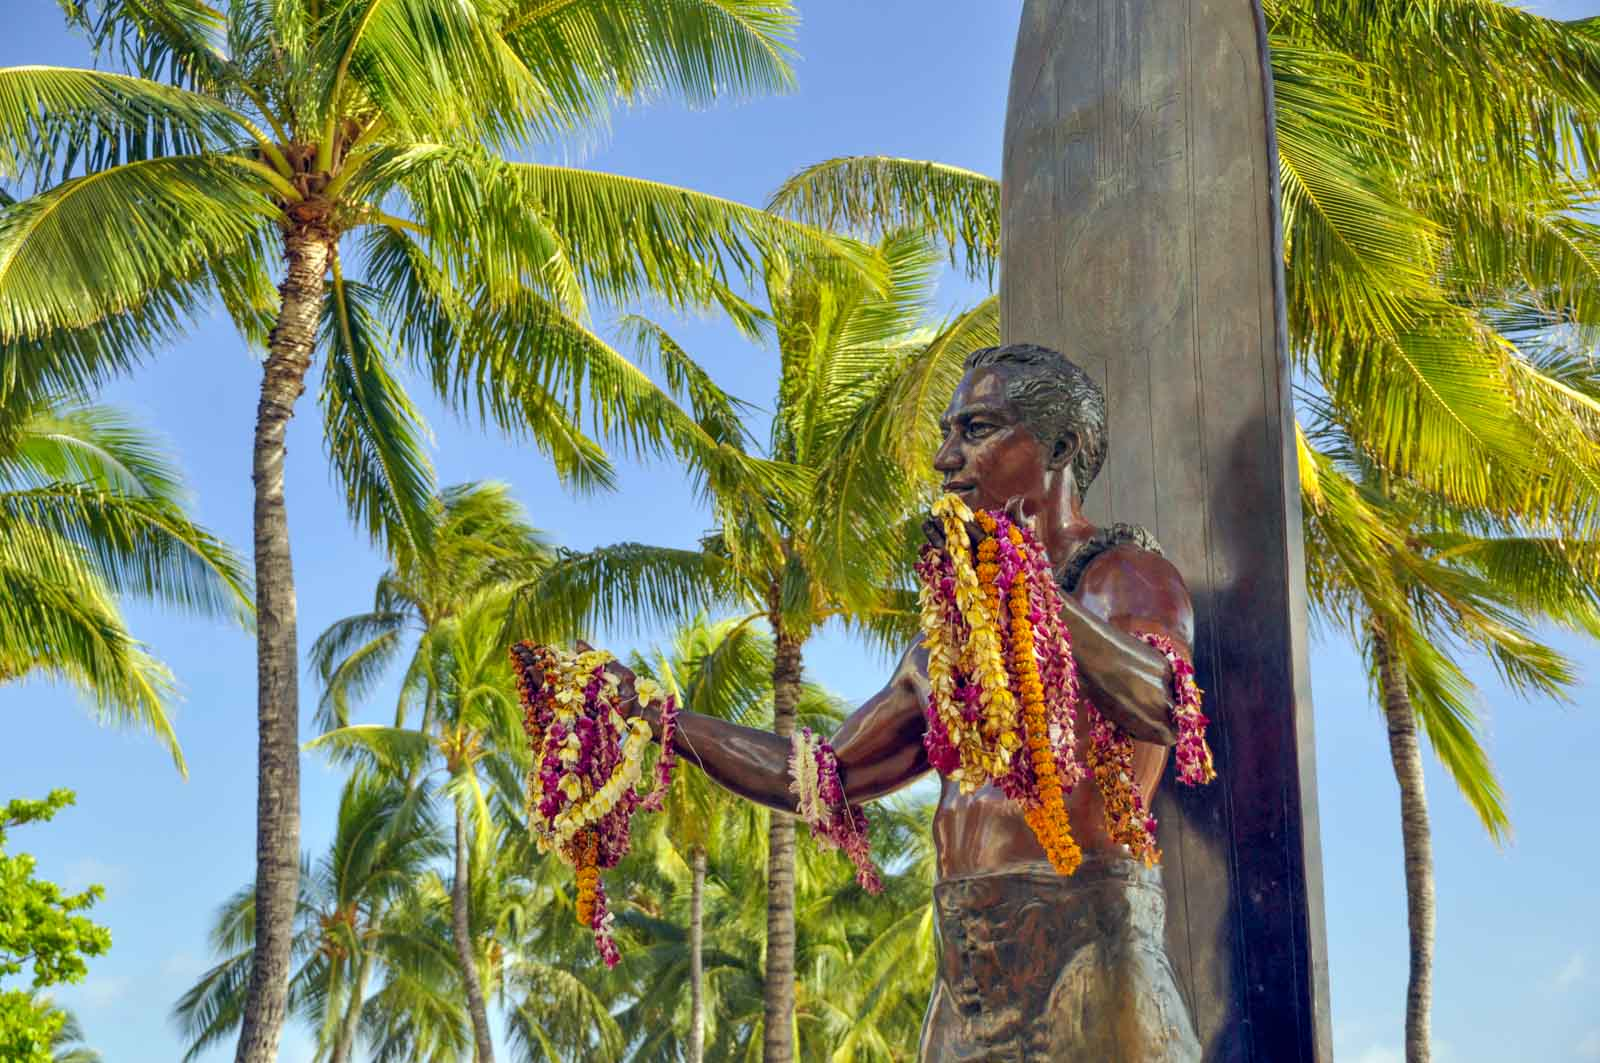 The bronze statue of Duke Kahanamoku on Kuhio Beach, with leis draped over the arms and palm trees surrounding it.